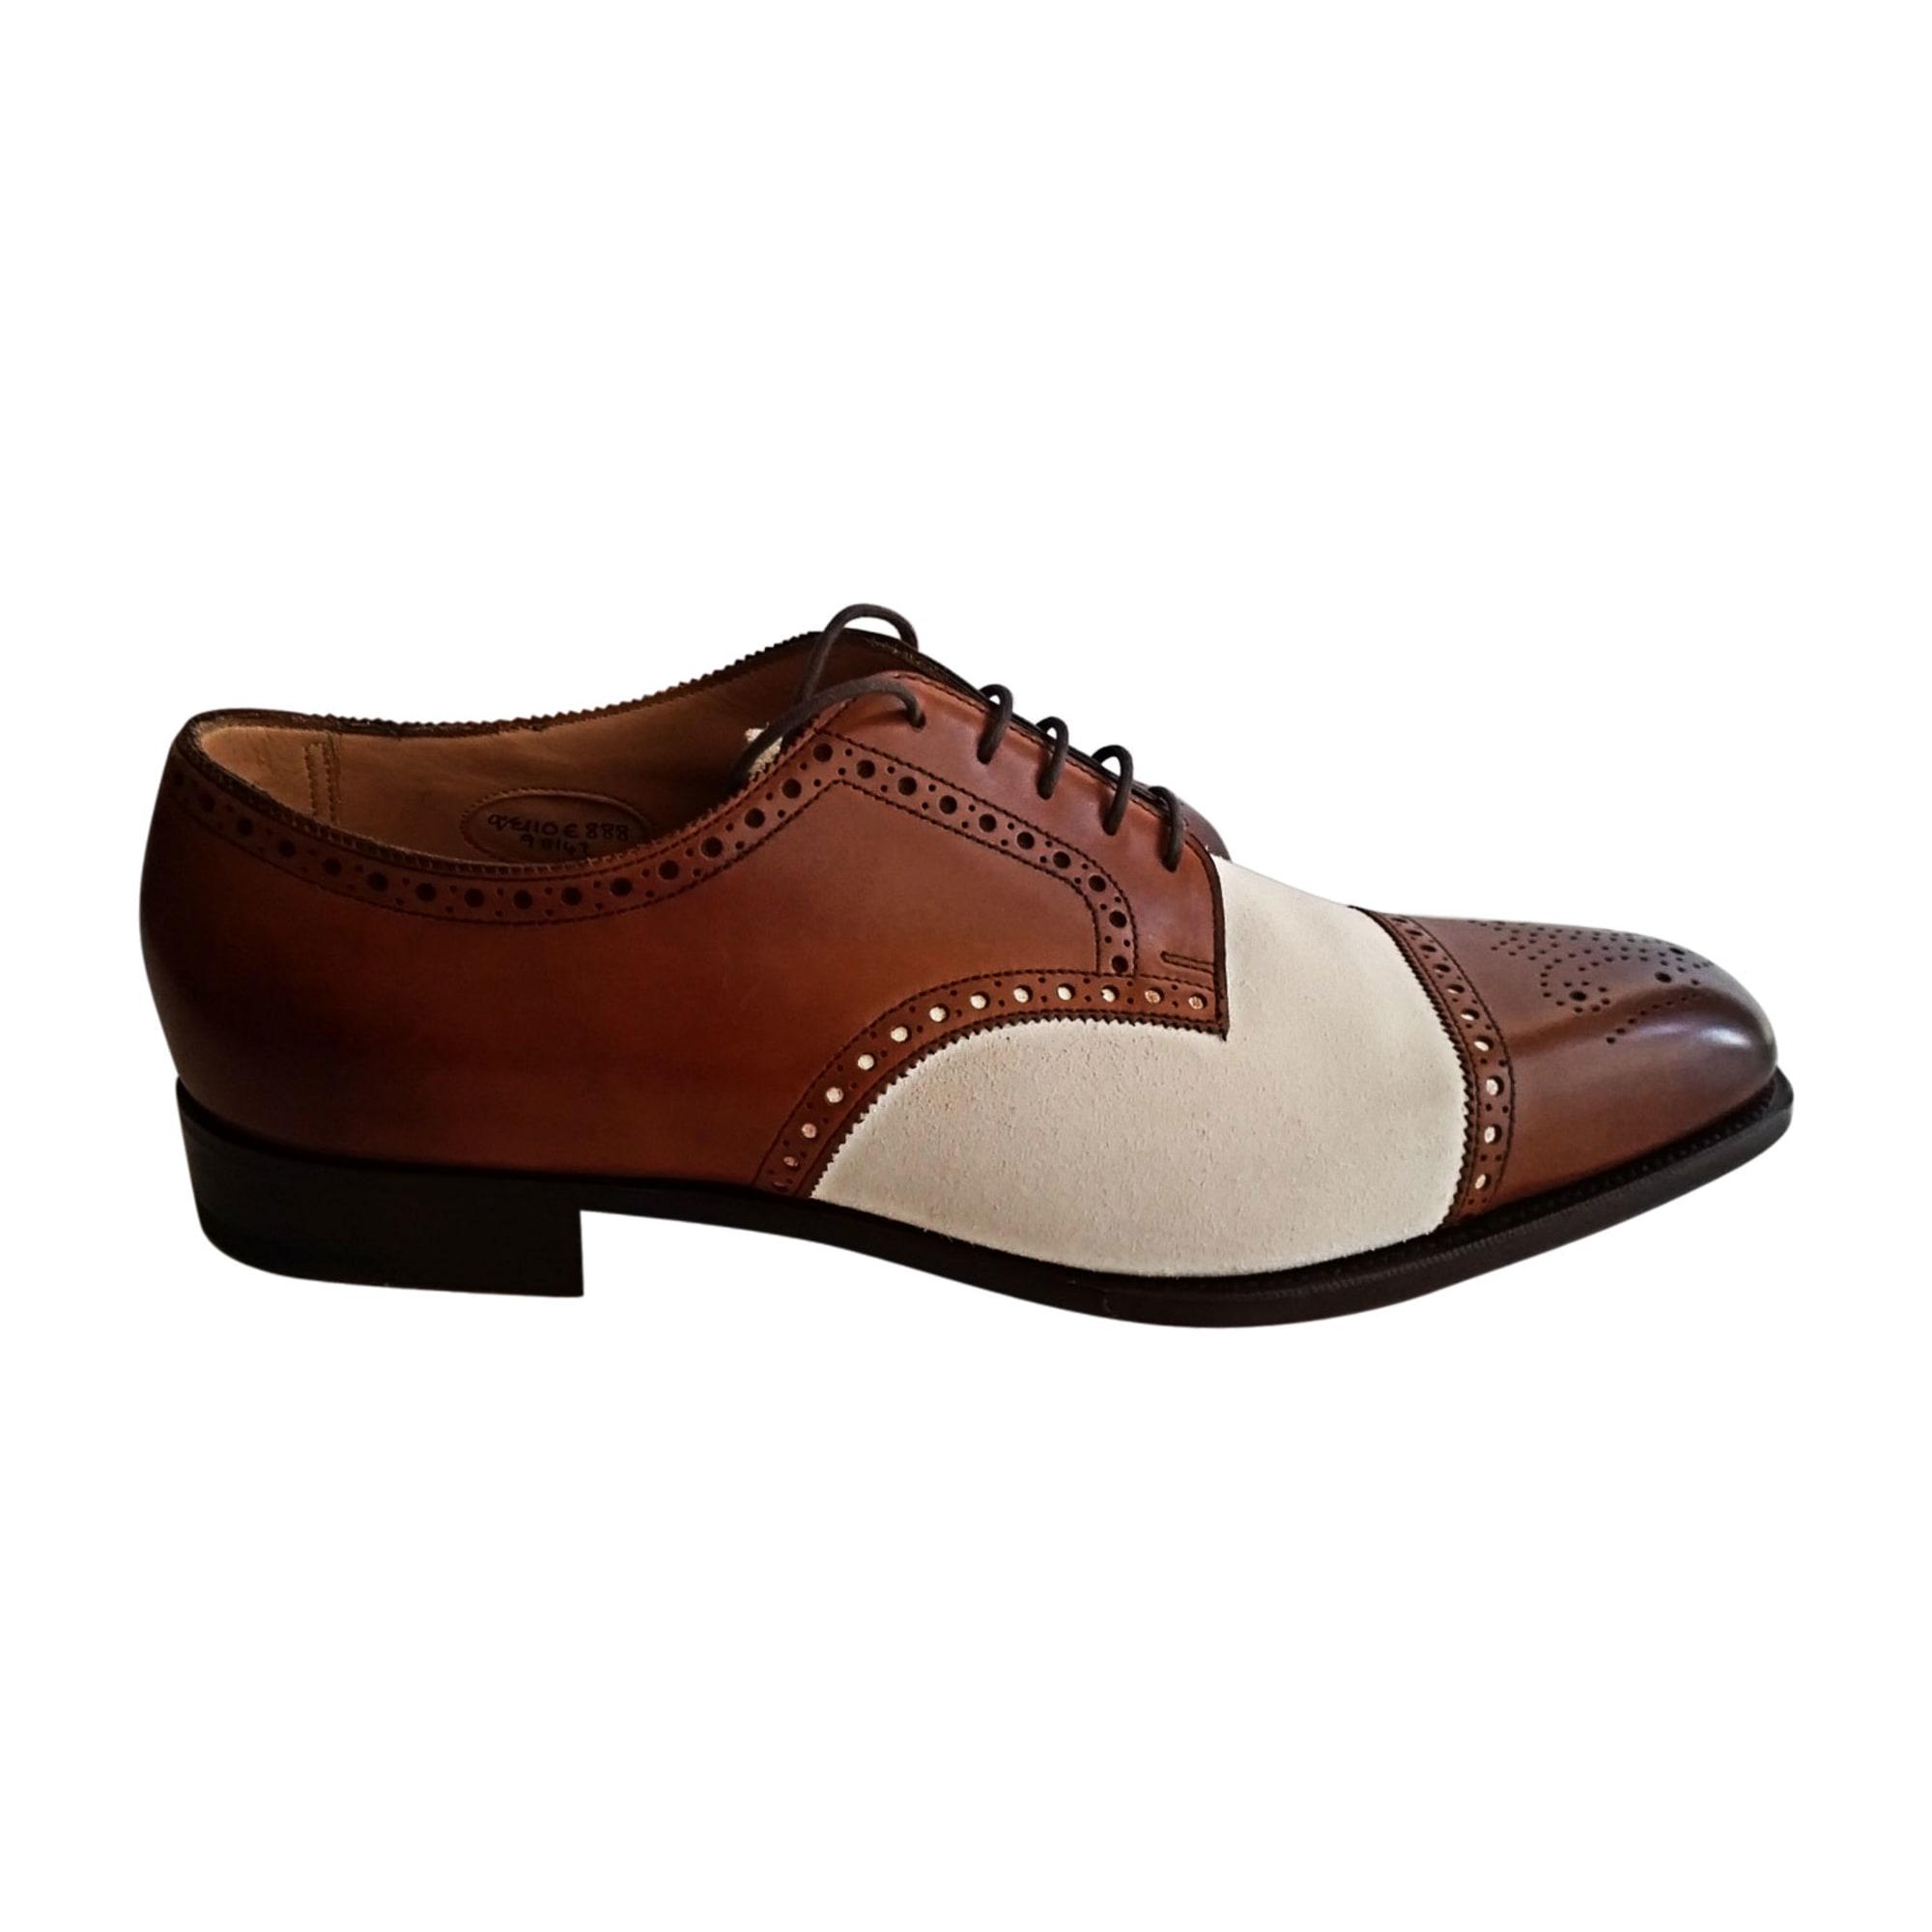 CHAUSSURES - Chaussures à lacetsRalph Lauren LnjxqD